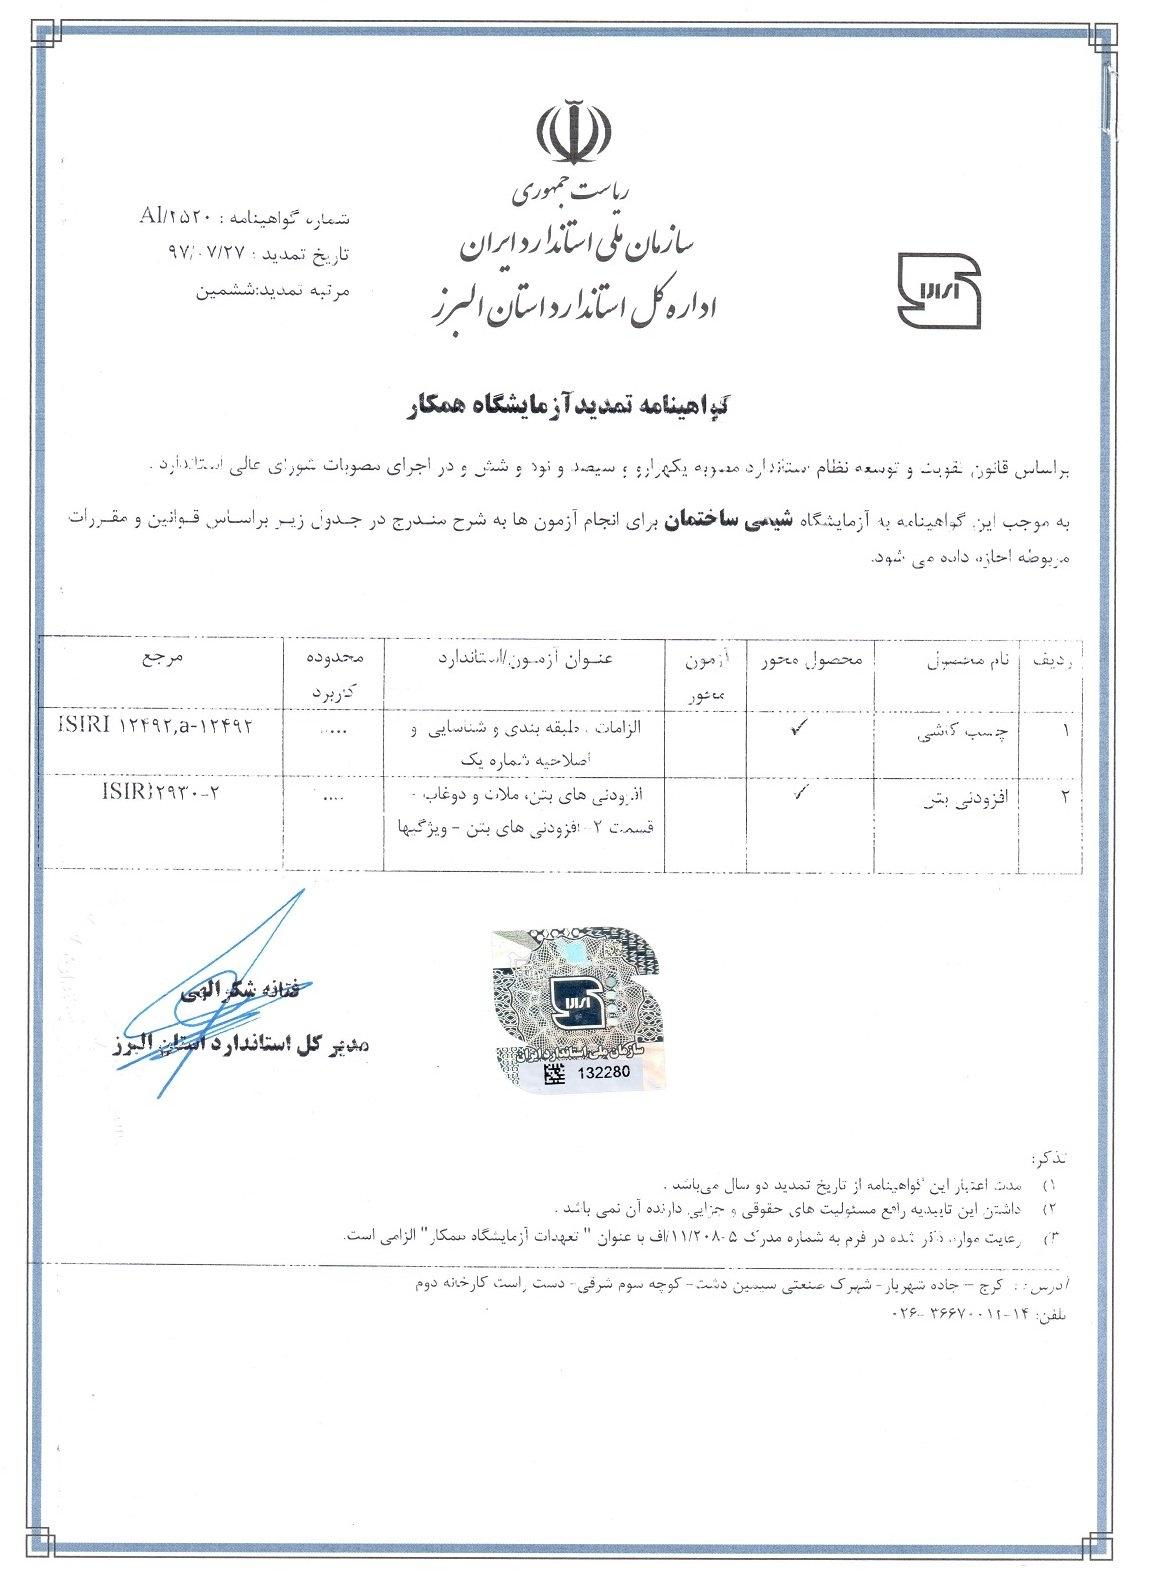 Standard Accredited Laboratory